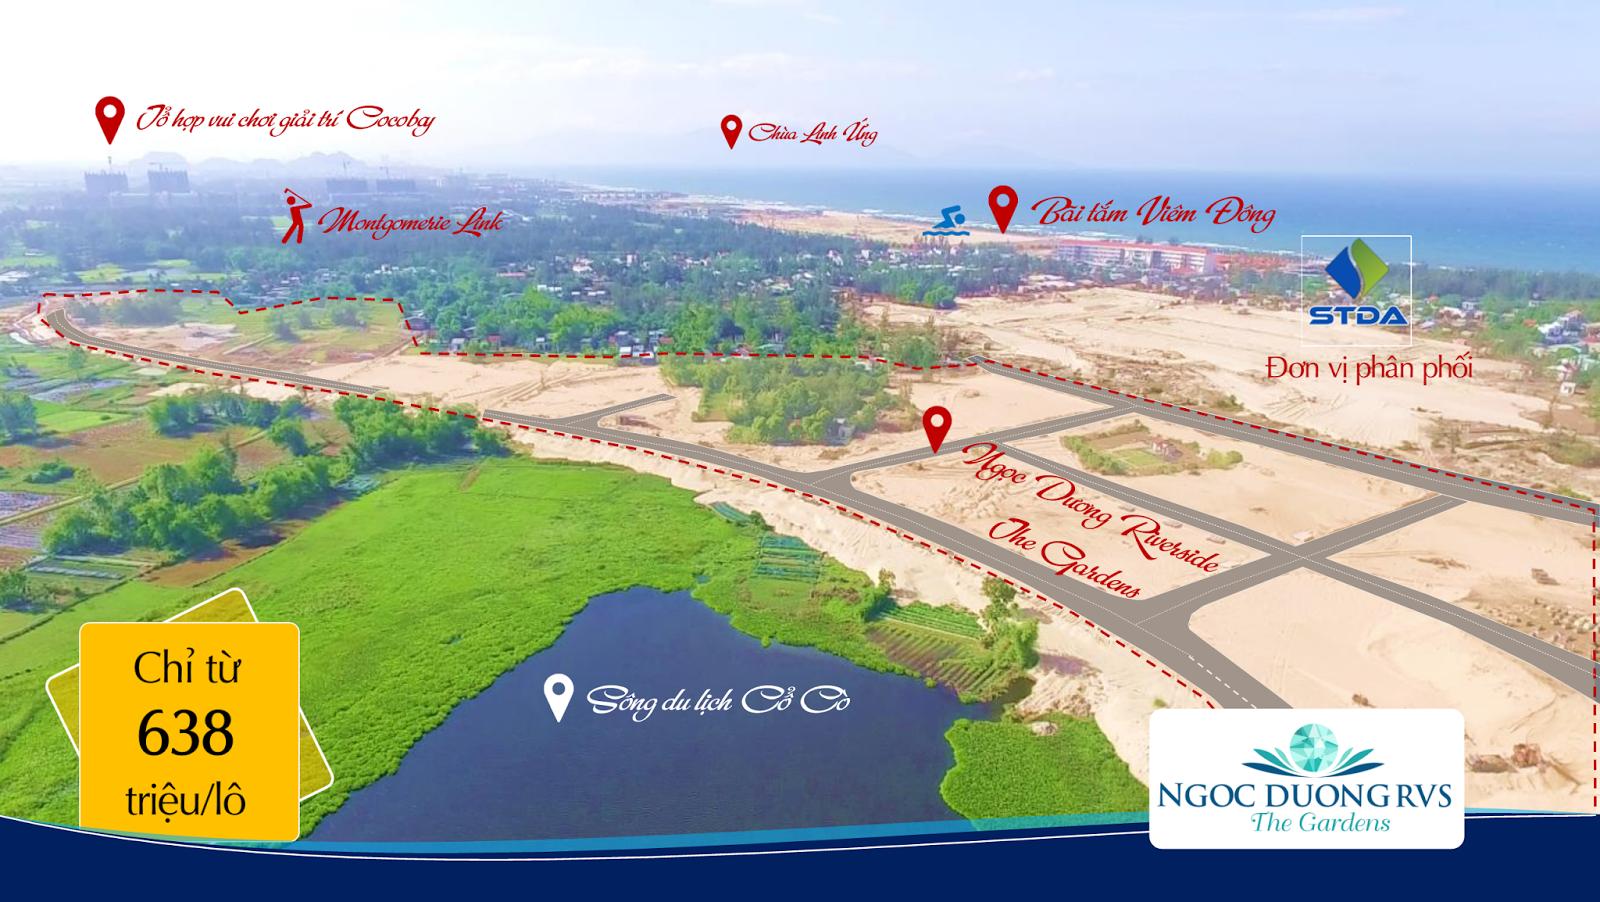 phoi-canh-ngoc-duong-riverside2